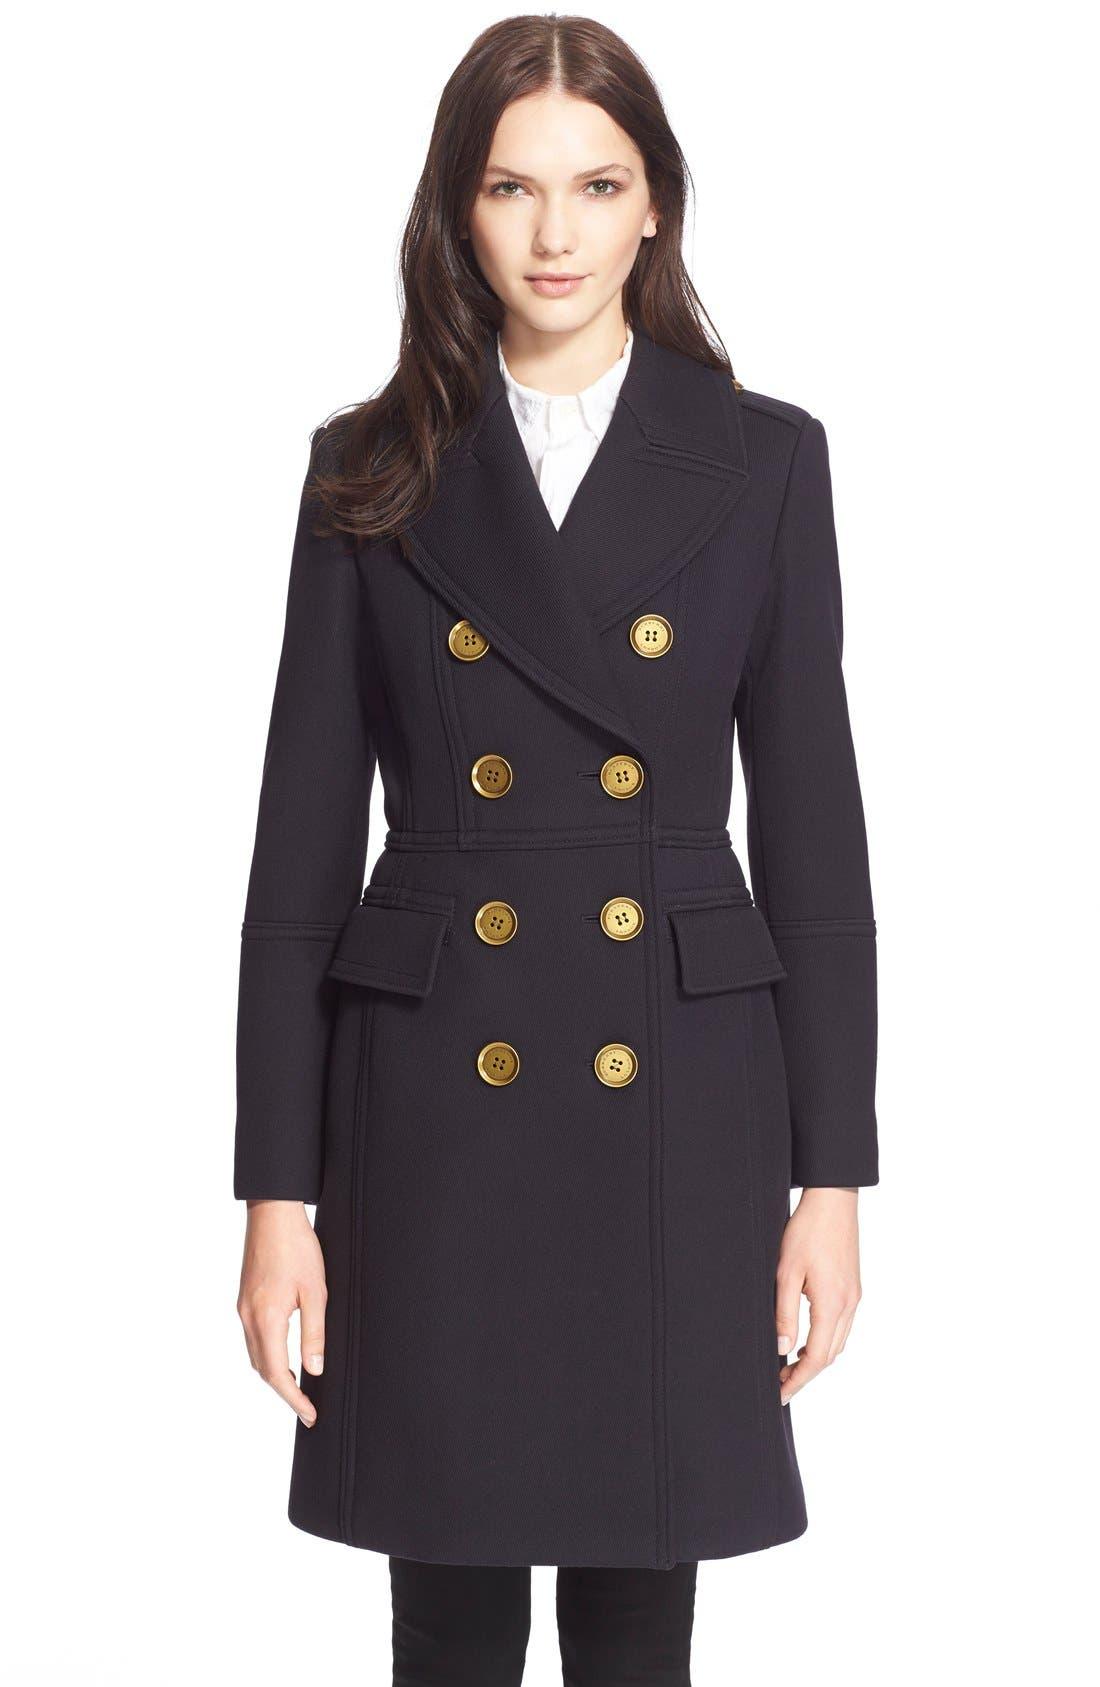 Main Image - BurberryLondon 'Whittingstall' Wool Military Coat